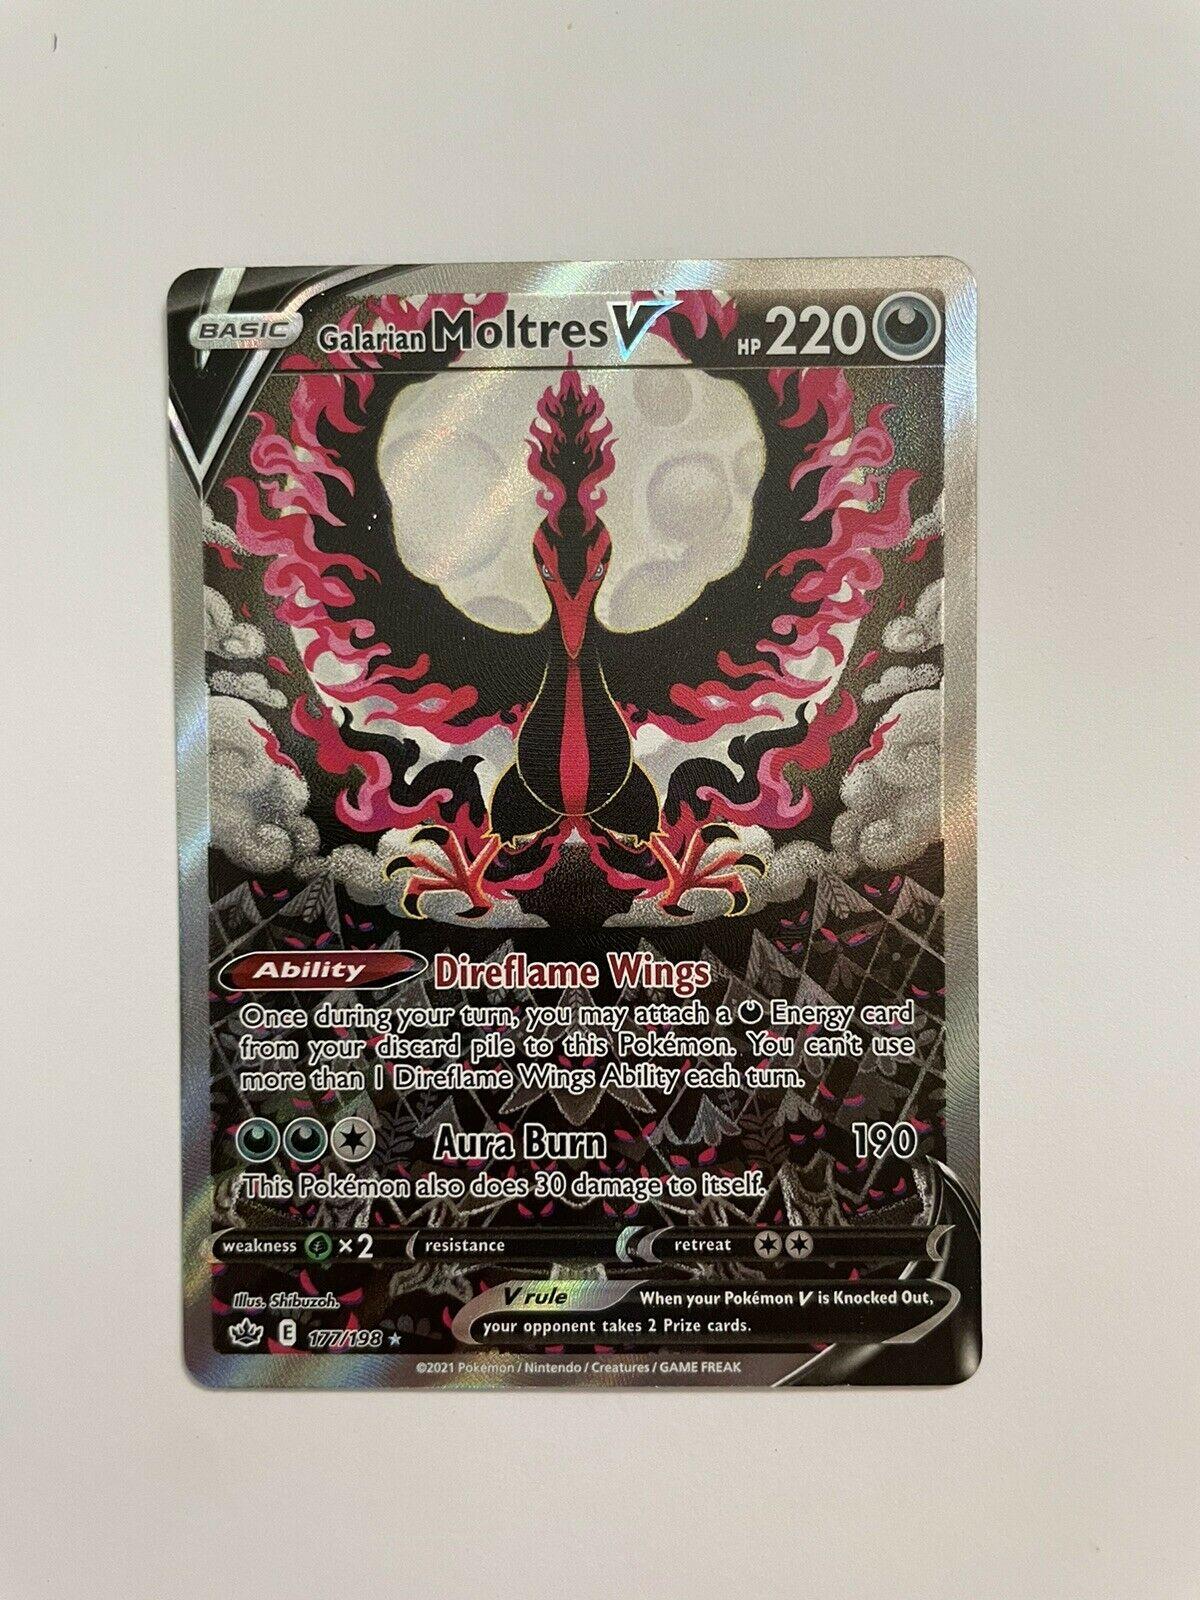 Galarian Moltres V - [177/198] Pokemon Chilling Reign-Alternate Art-Ultra Rare